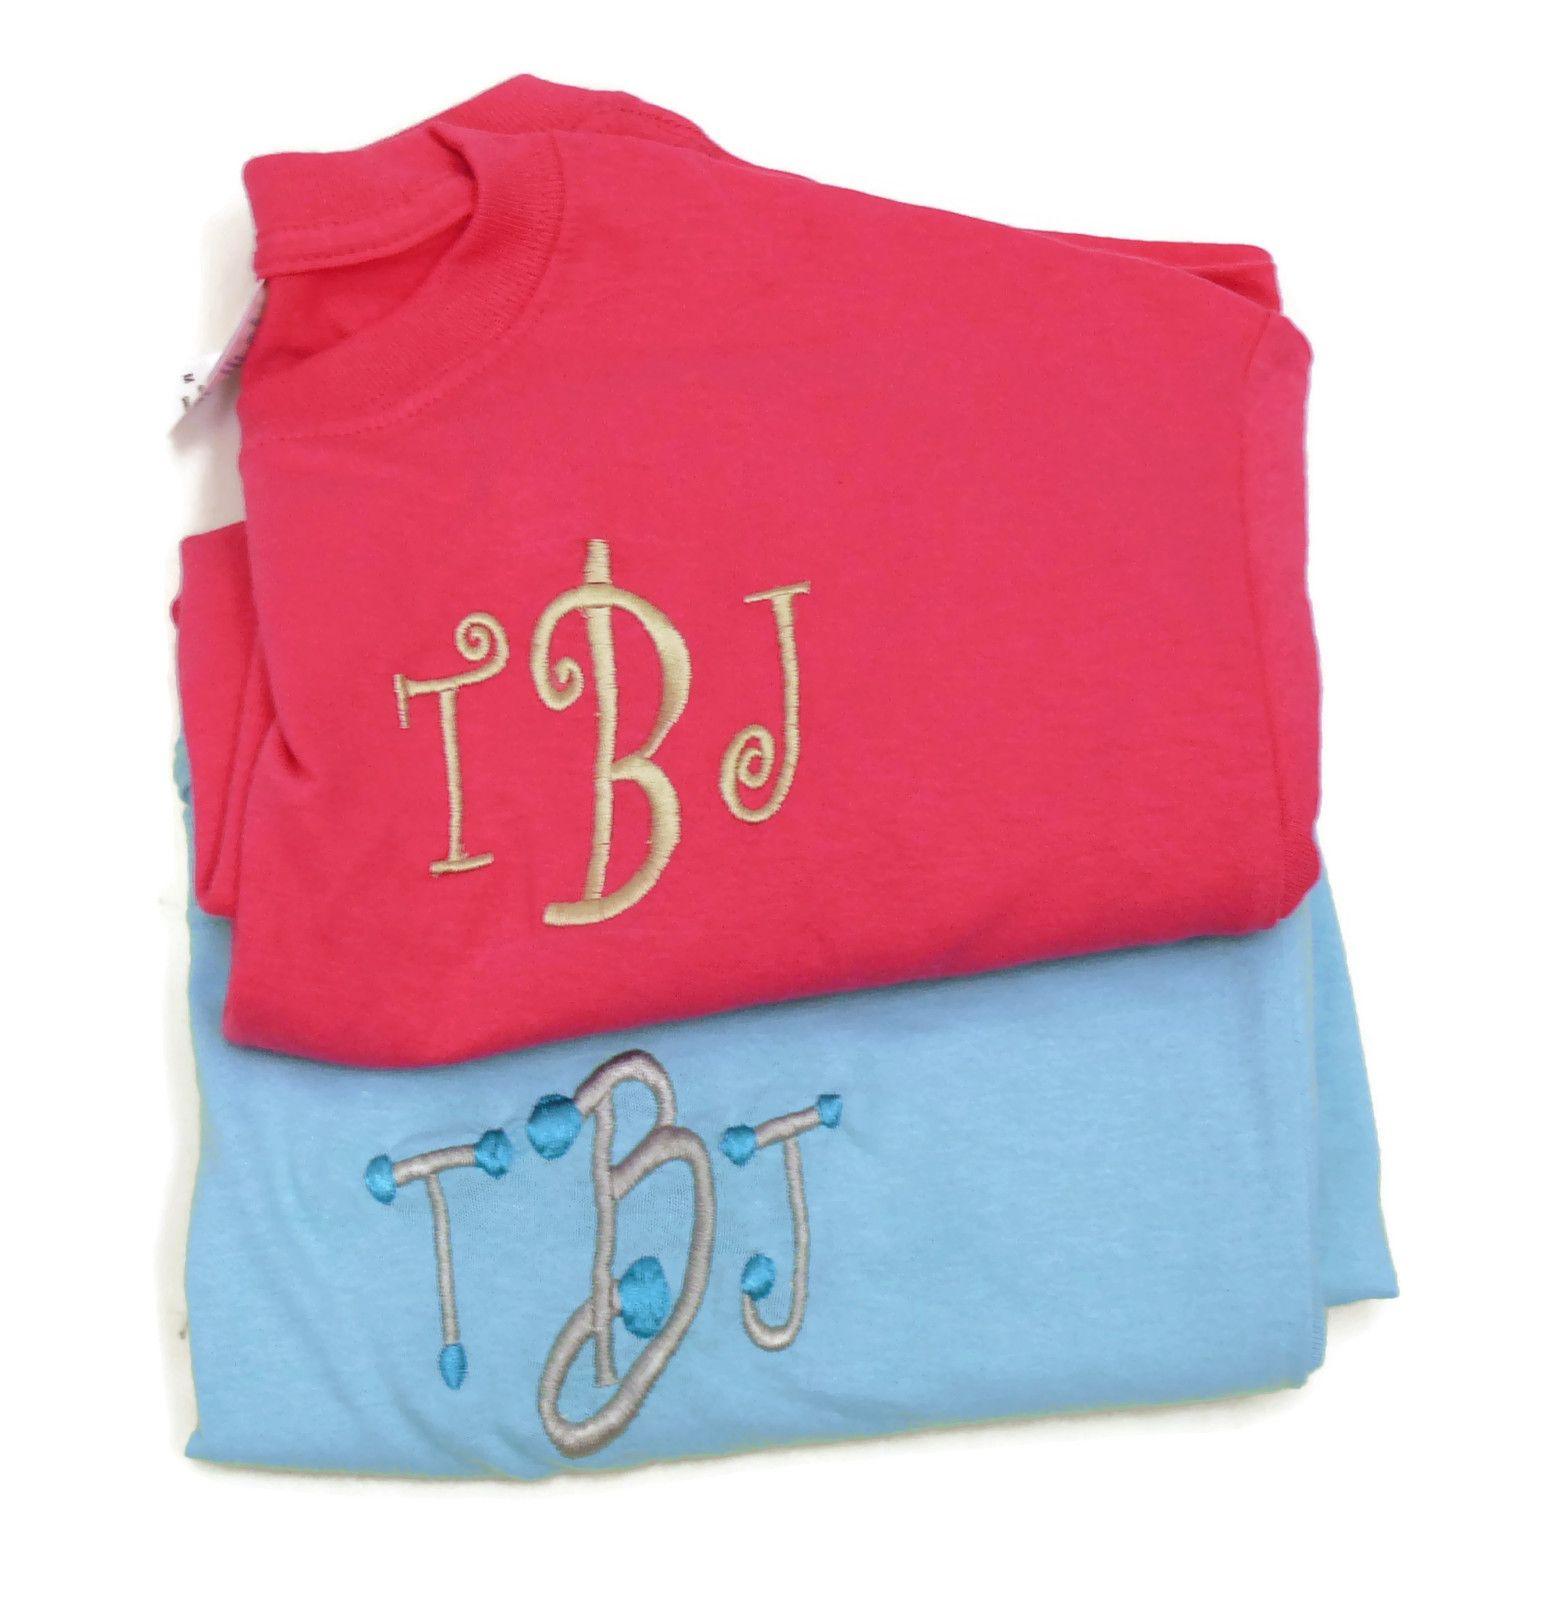 Monogrammed t shirts tbj monograms